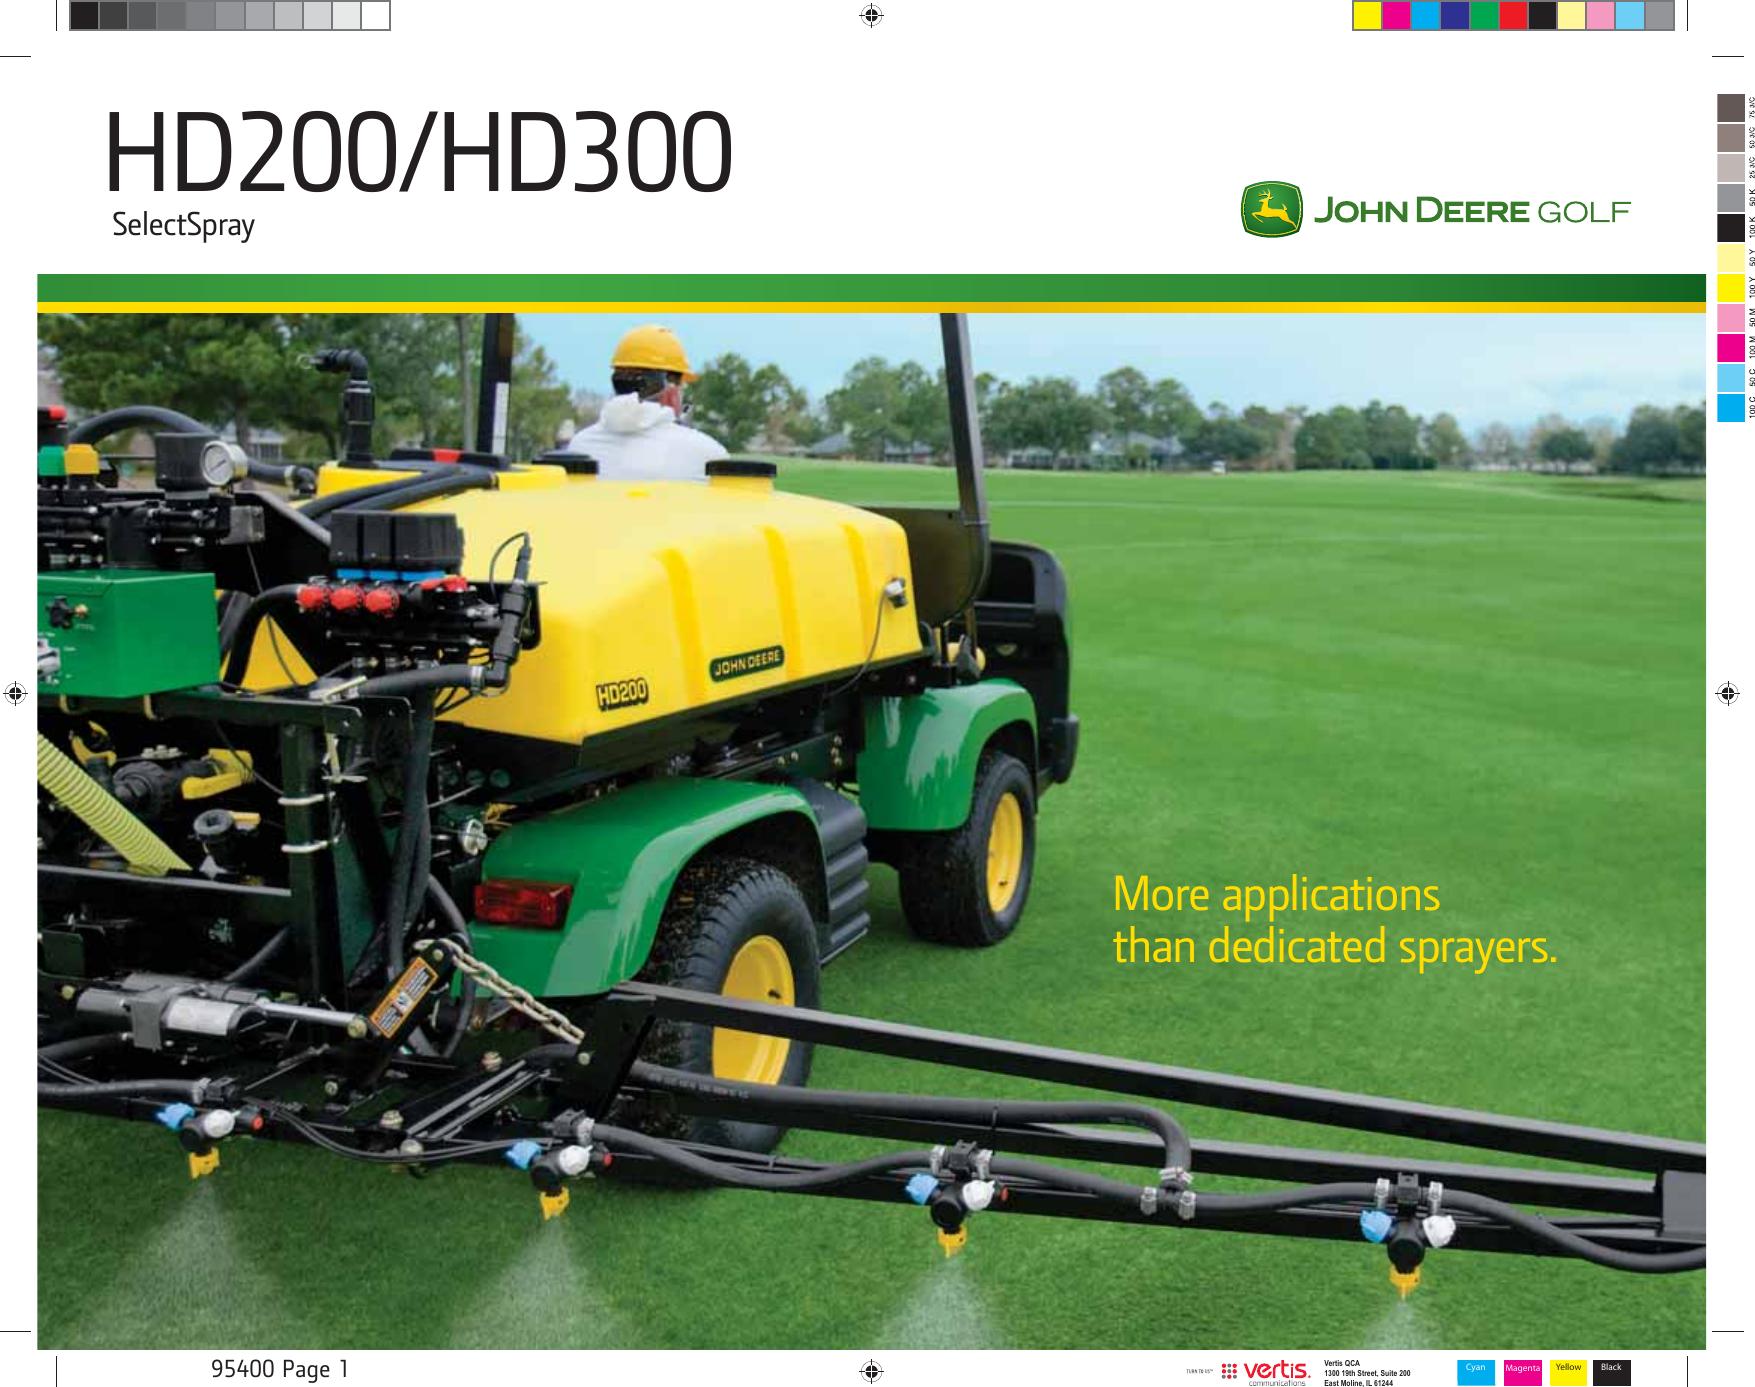 John Deere Hd200 Users Manual